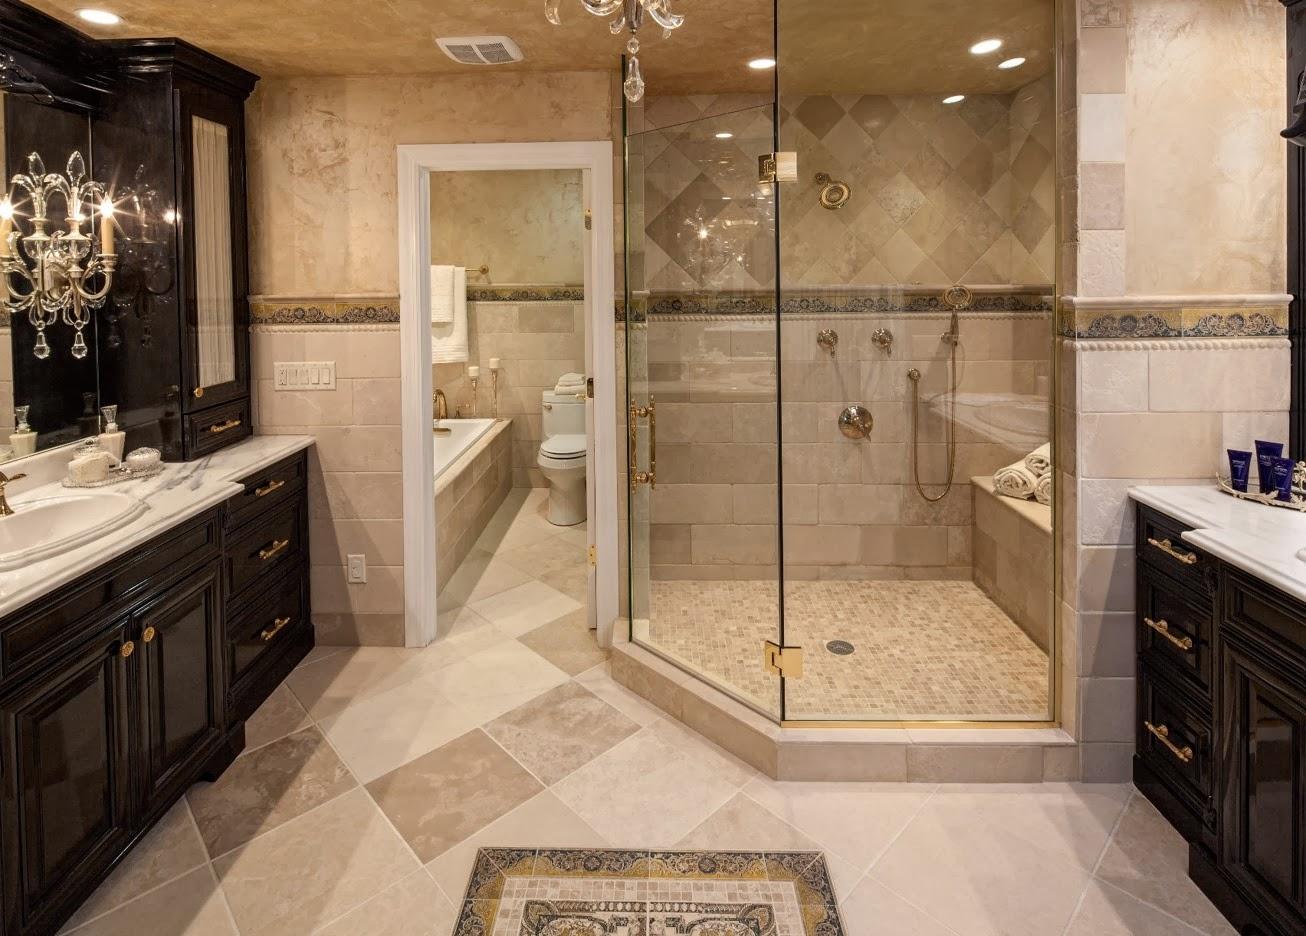 interior design society online portfolio 2013 designer of the year award winners bathrooms. Black Bedroom Furniture Sets. Home Design Ideas